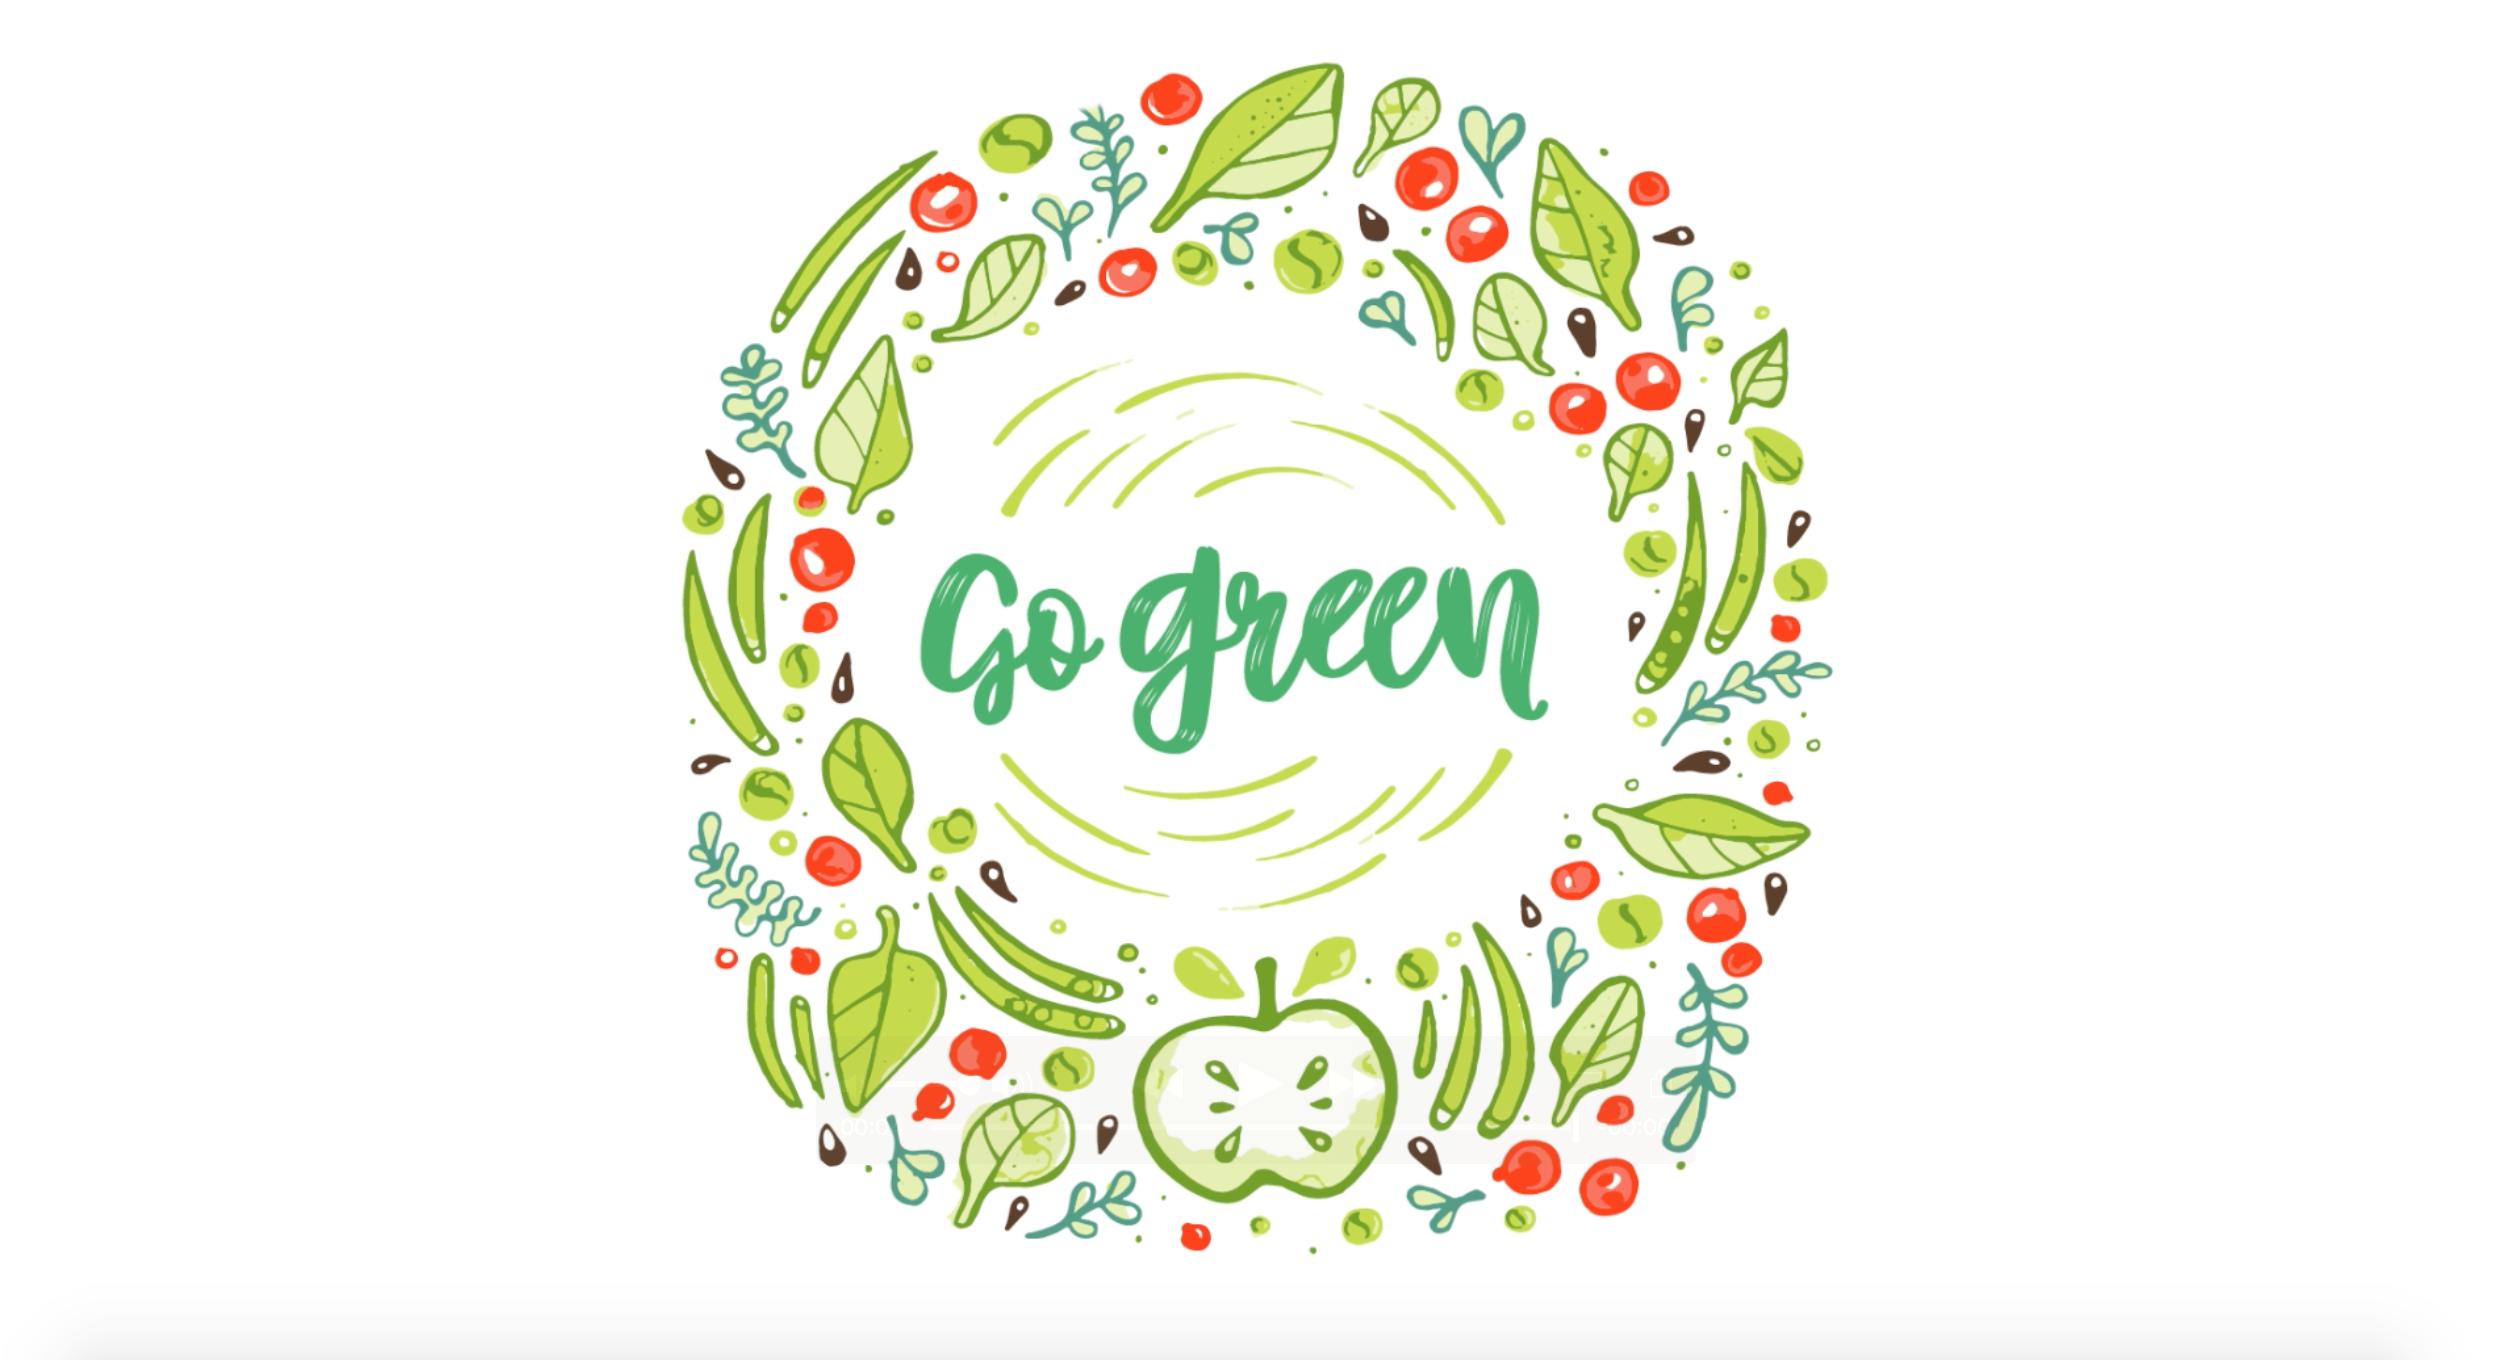 Vegan and vegetarian branding: inspiring examples of ethical design